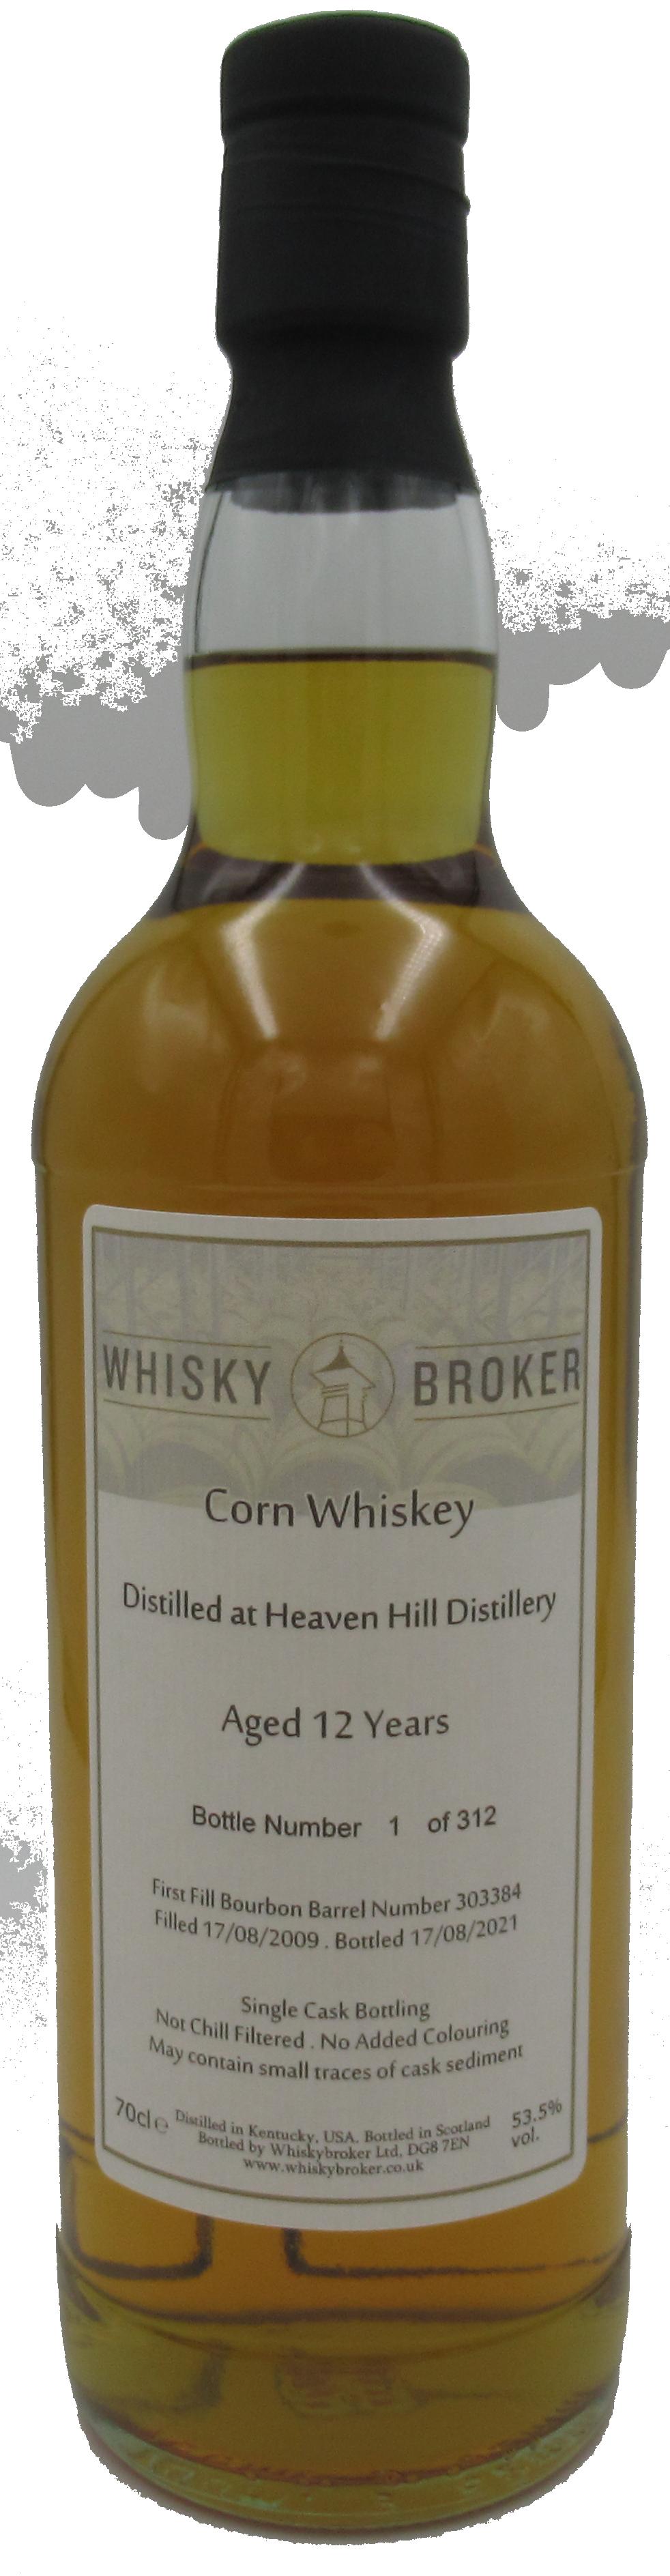 70cl, 12yo Distilled at Heaven Hill Distillery